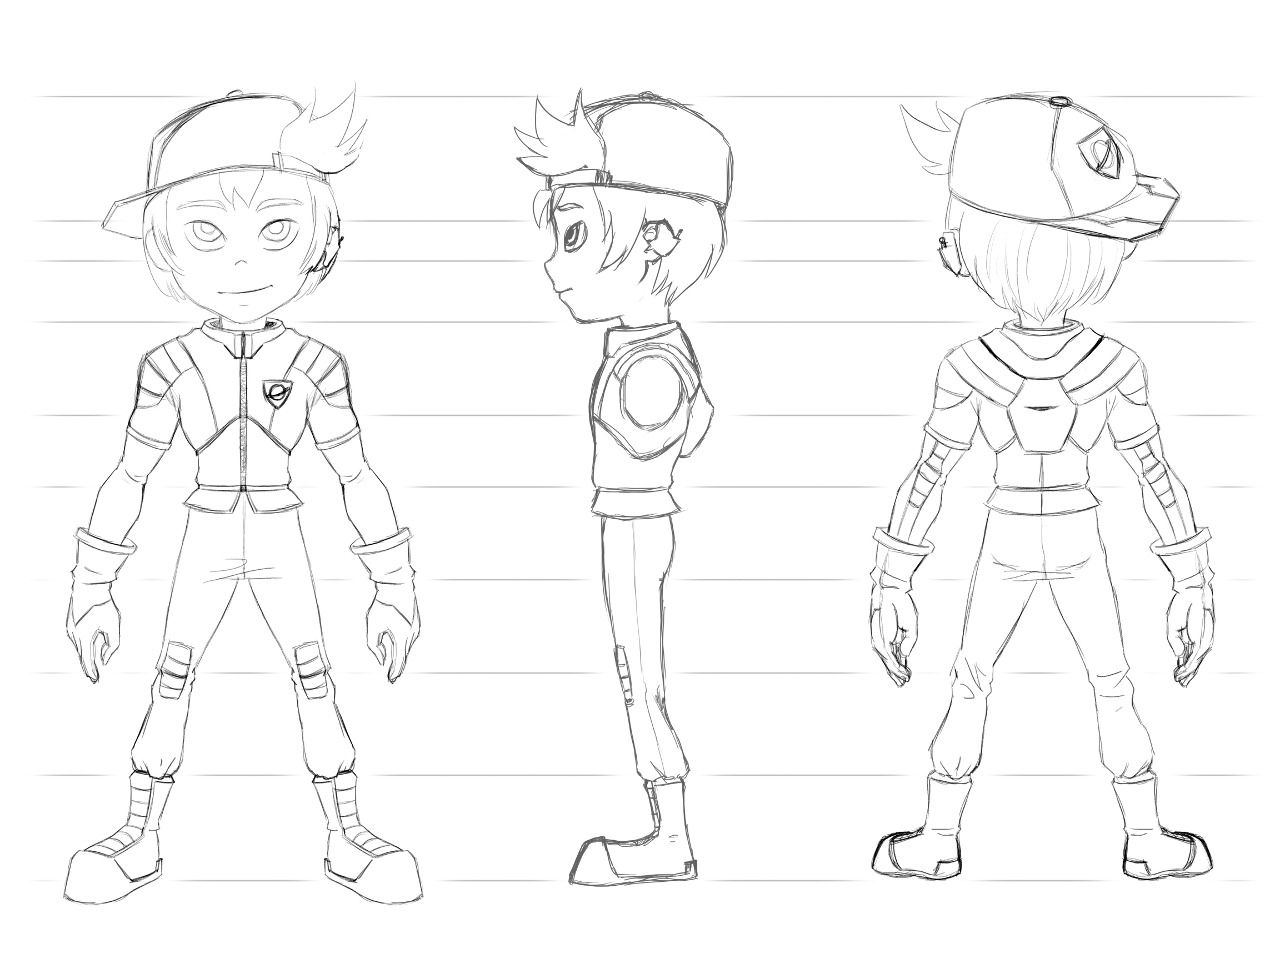 Blender Character Modeling 10 Of 10 : Blender character drawing